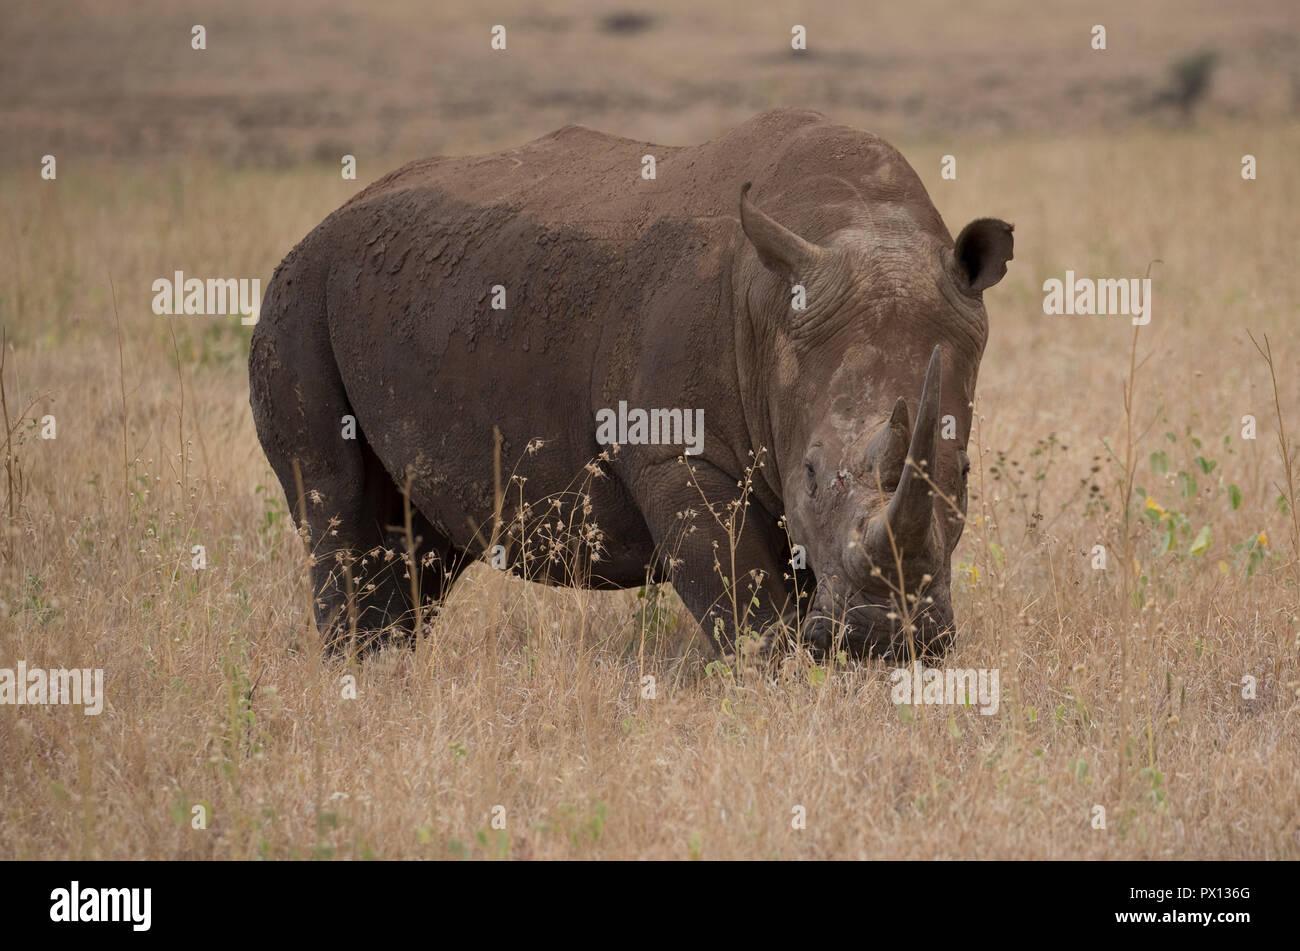 Southern white rhinoceros or southern square-lipped rhinoceros Ceratotherium simum simum Lewa Conservancy Kenya Stock Photo